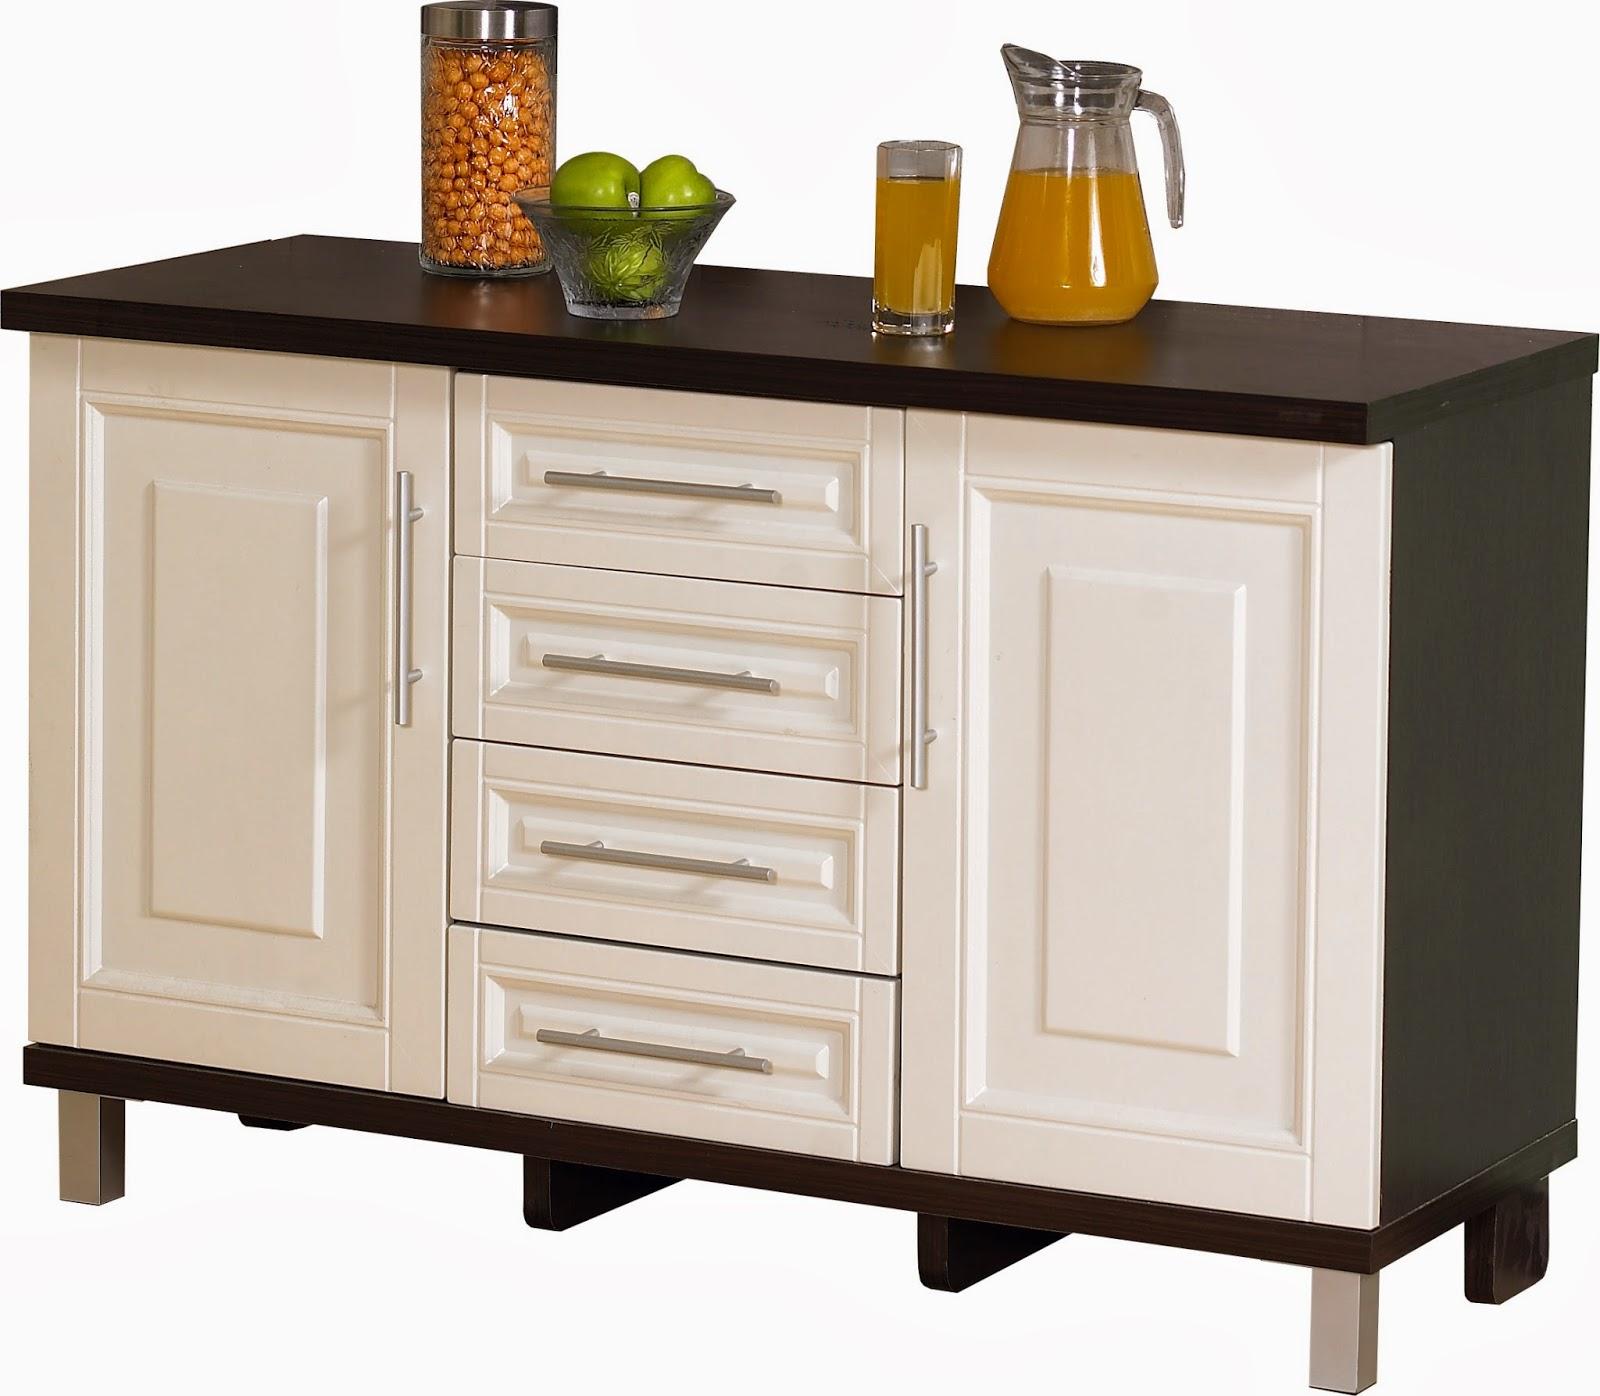 Laci Kitchen Set: Kitchen Set Mutiara Series